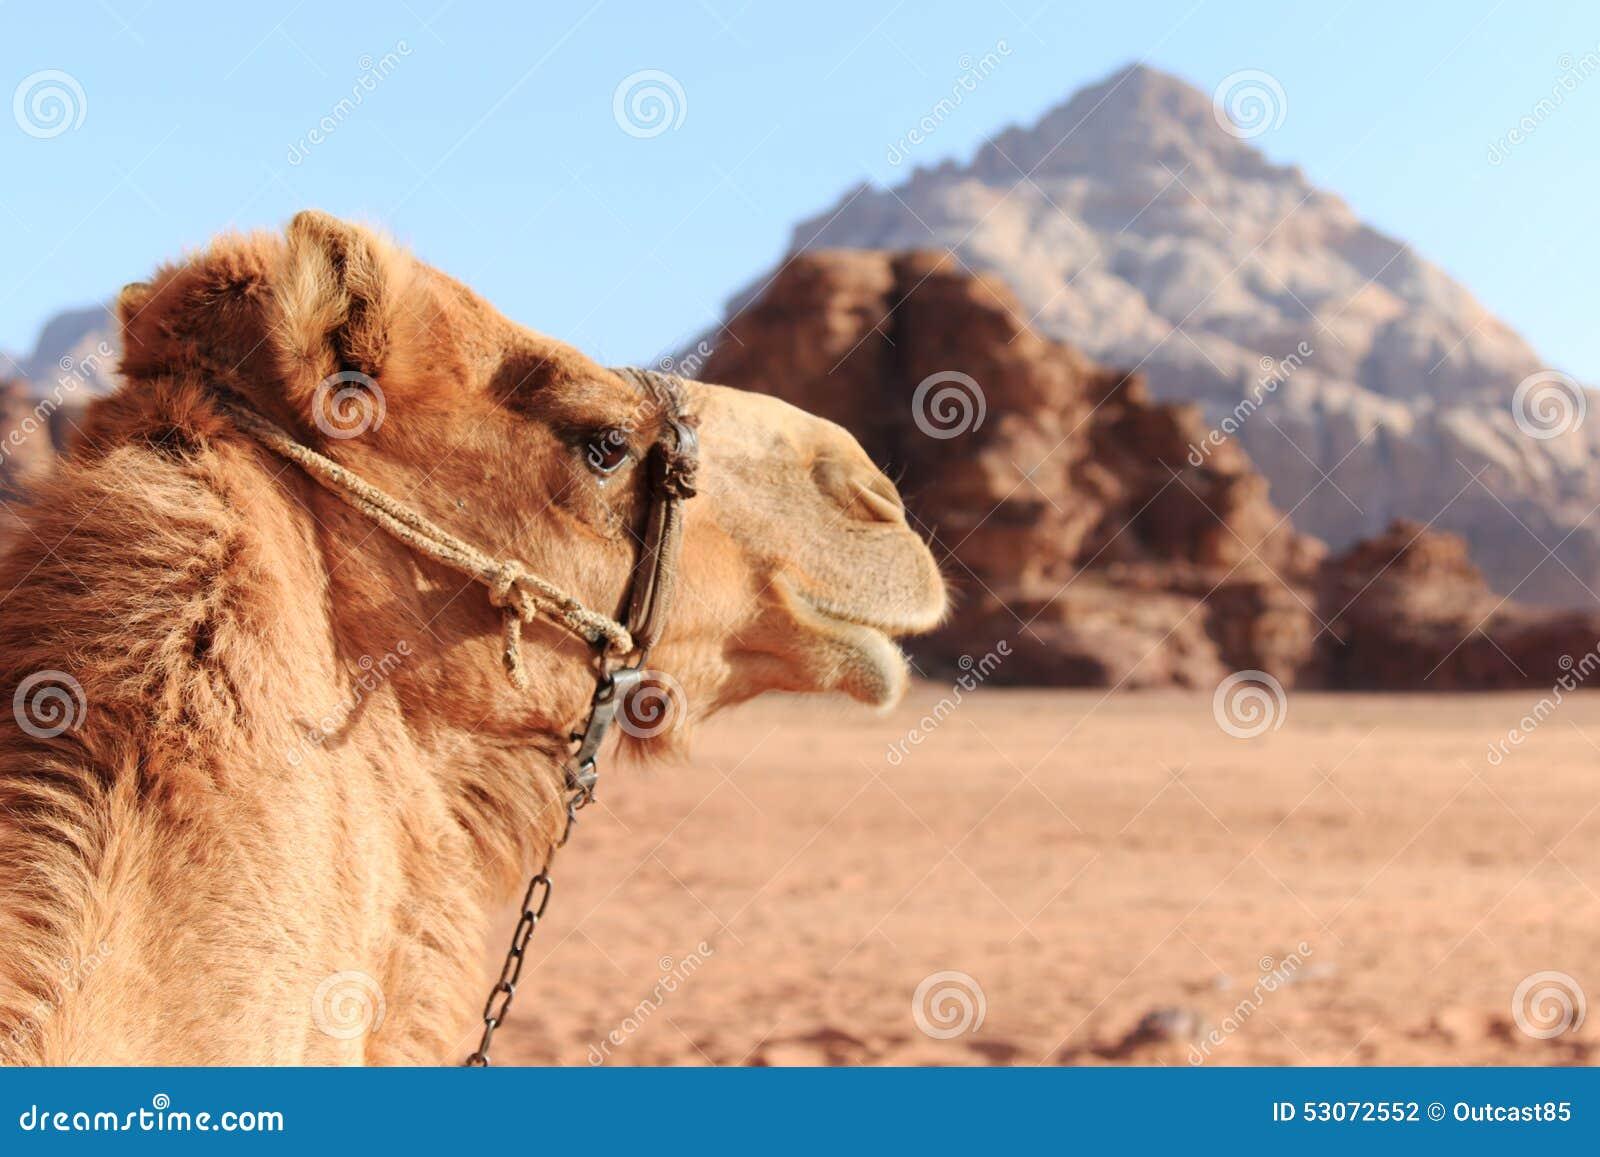 Camel in the Wadi Rum desert, Jordan, at sunset